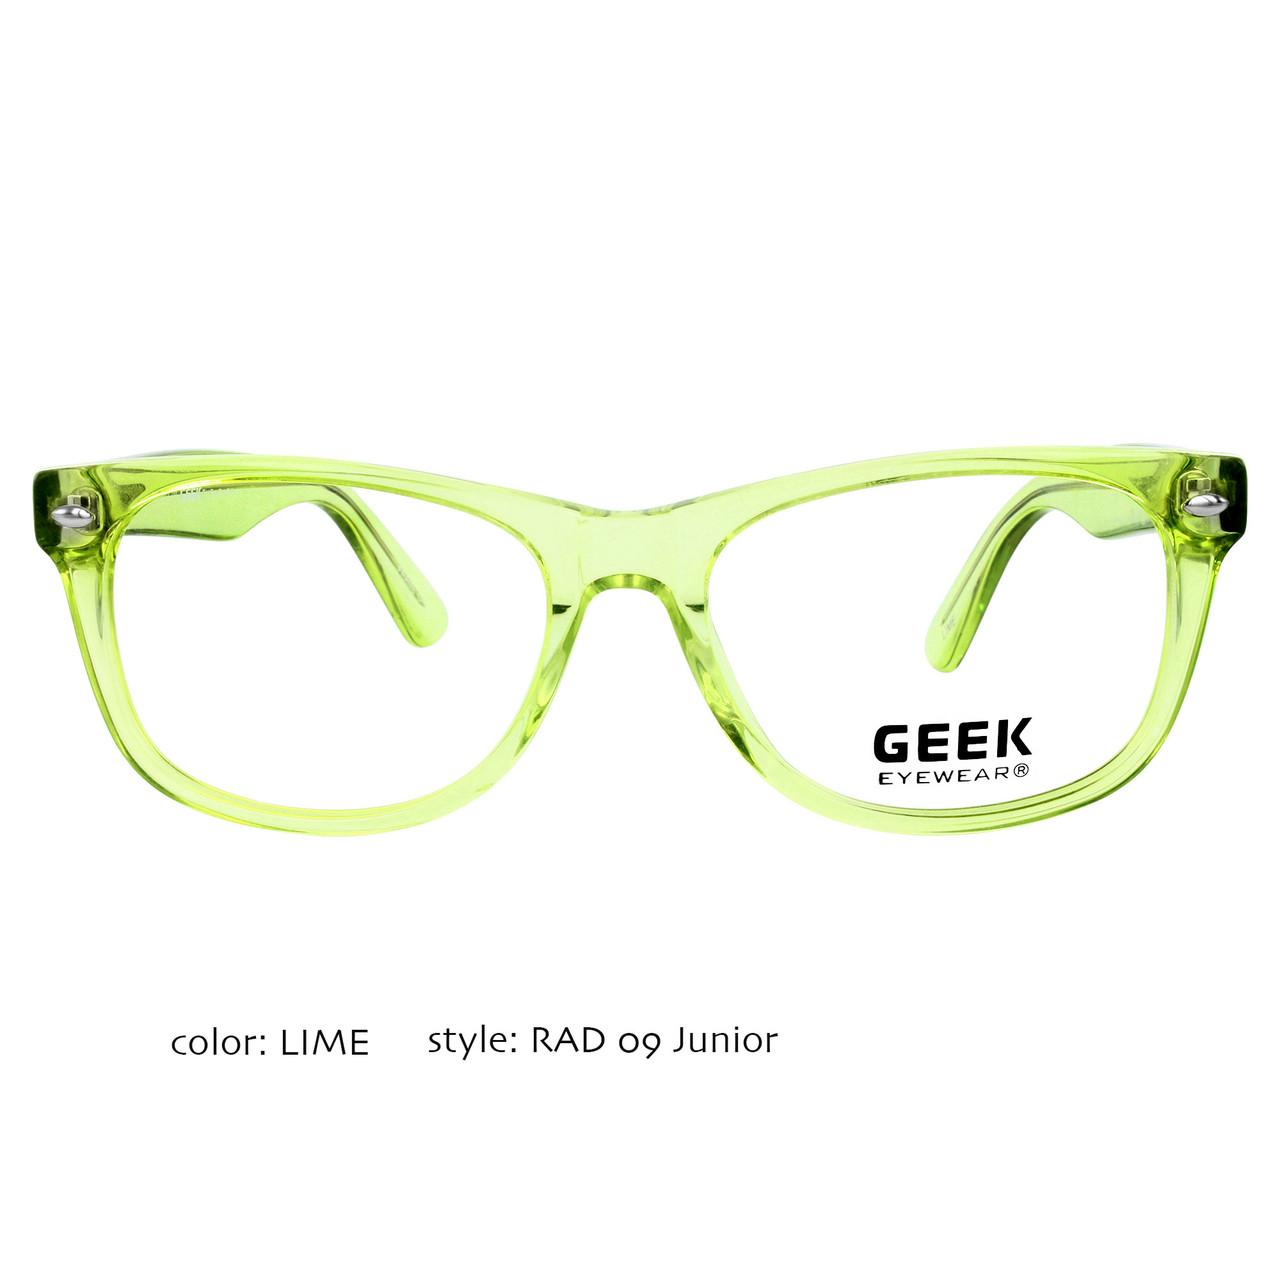 GEEK Eyewear RAD 09 Junior